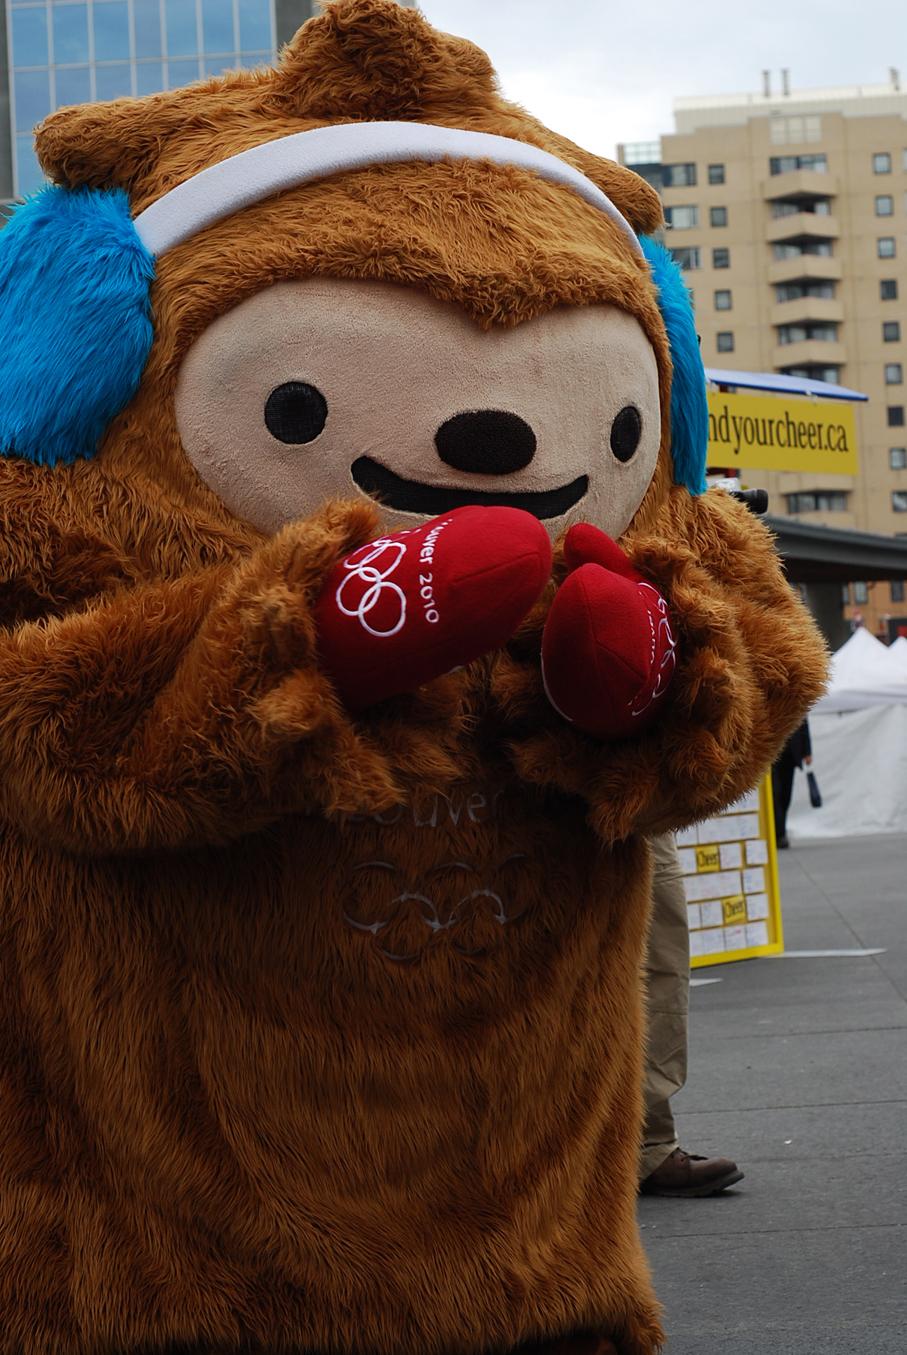 http://upload.wikimedia.org/wikipedia/commons/8/8d/Quatchi_(mascot).jpg